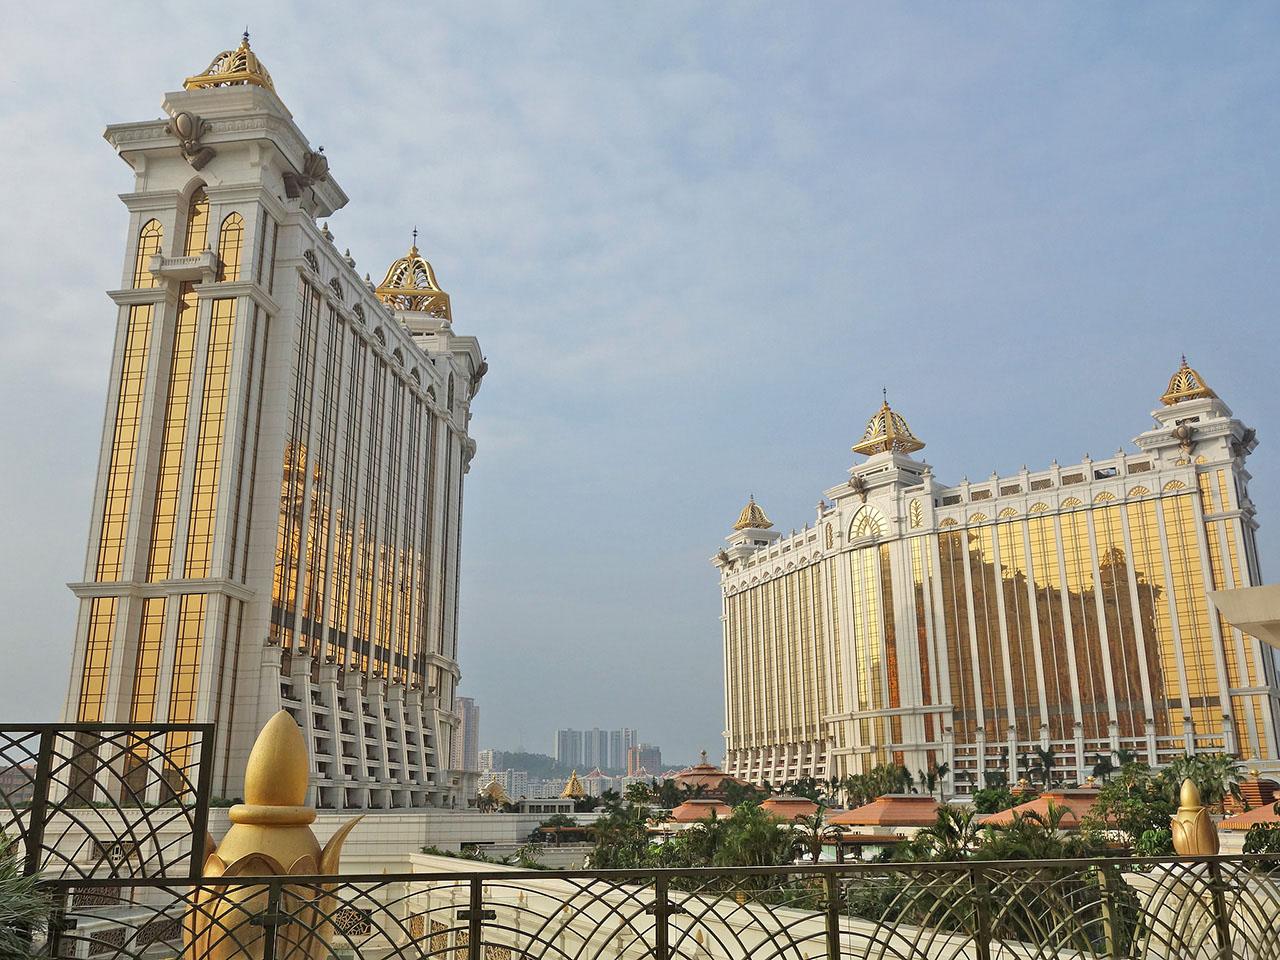 Galaxy Macauが豪華すぎる。流れるプールと砂浜があるホテルが凄い!